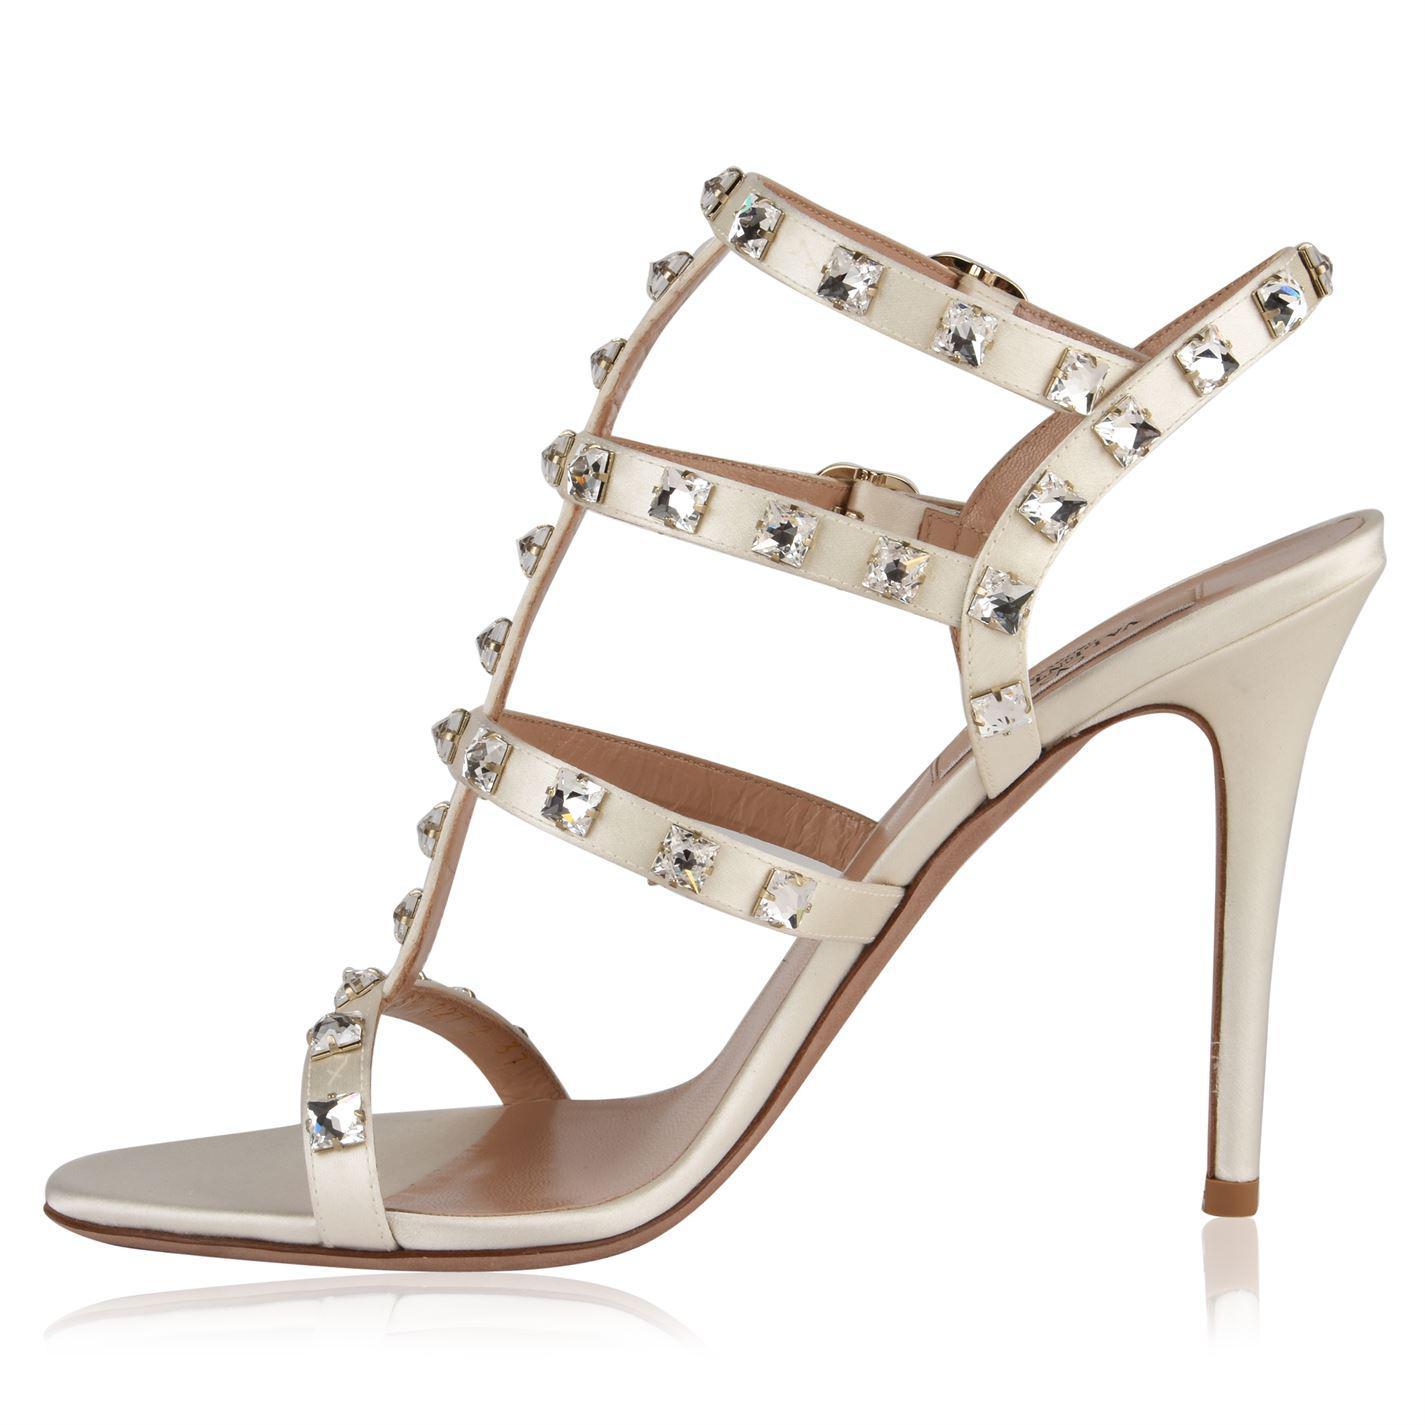 05b454f29ae ... Rockstud Crystal Heeled Sandals - Lyst. View fullscreen